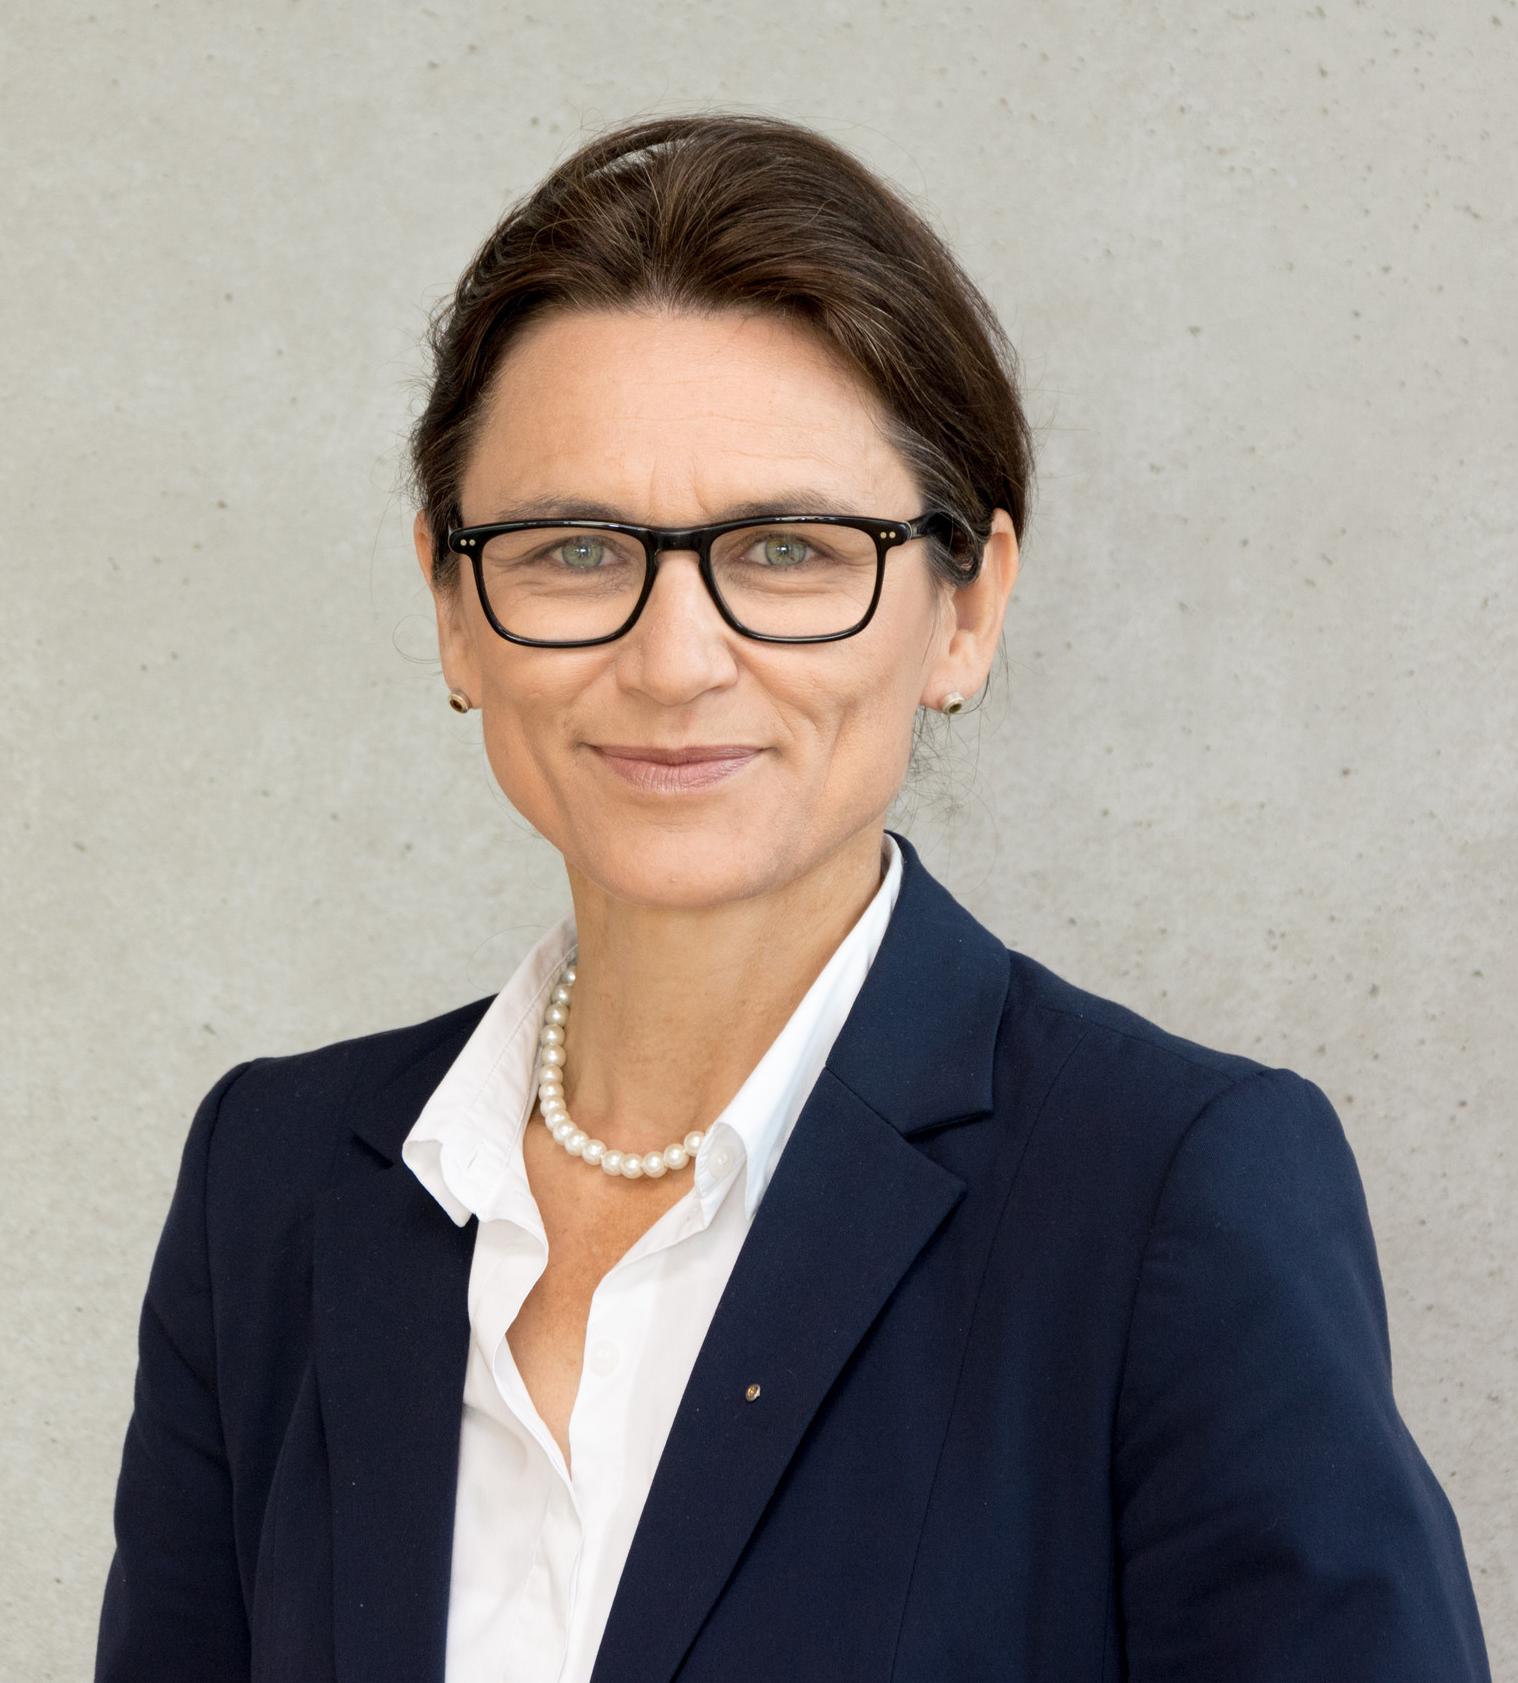 Prof. Dr. Martina Klärle (c)B.Bieber